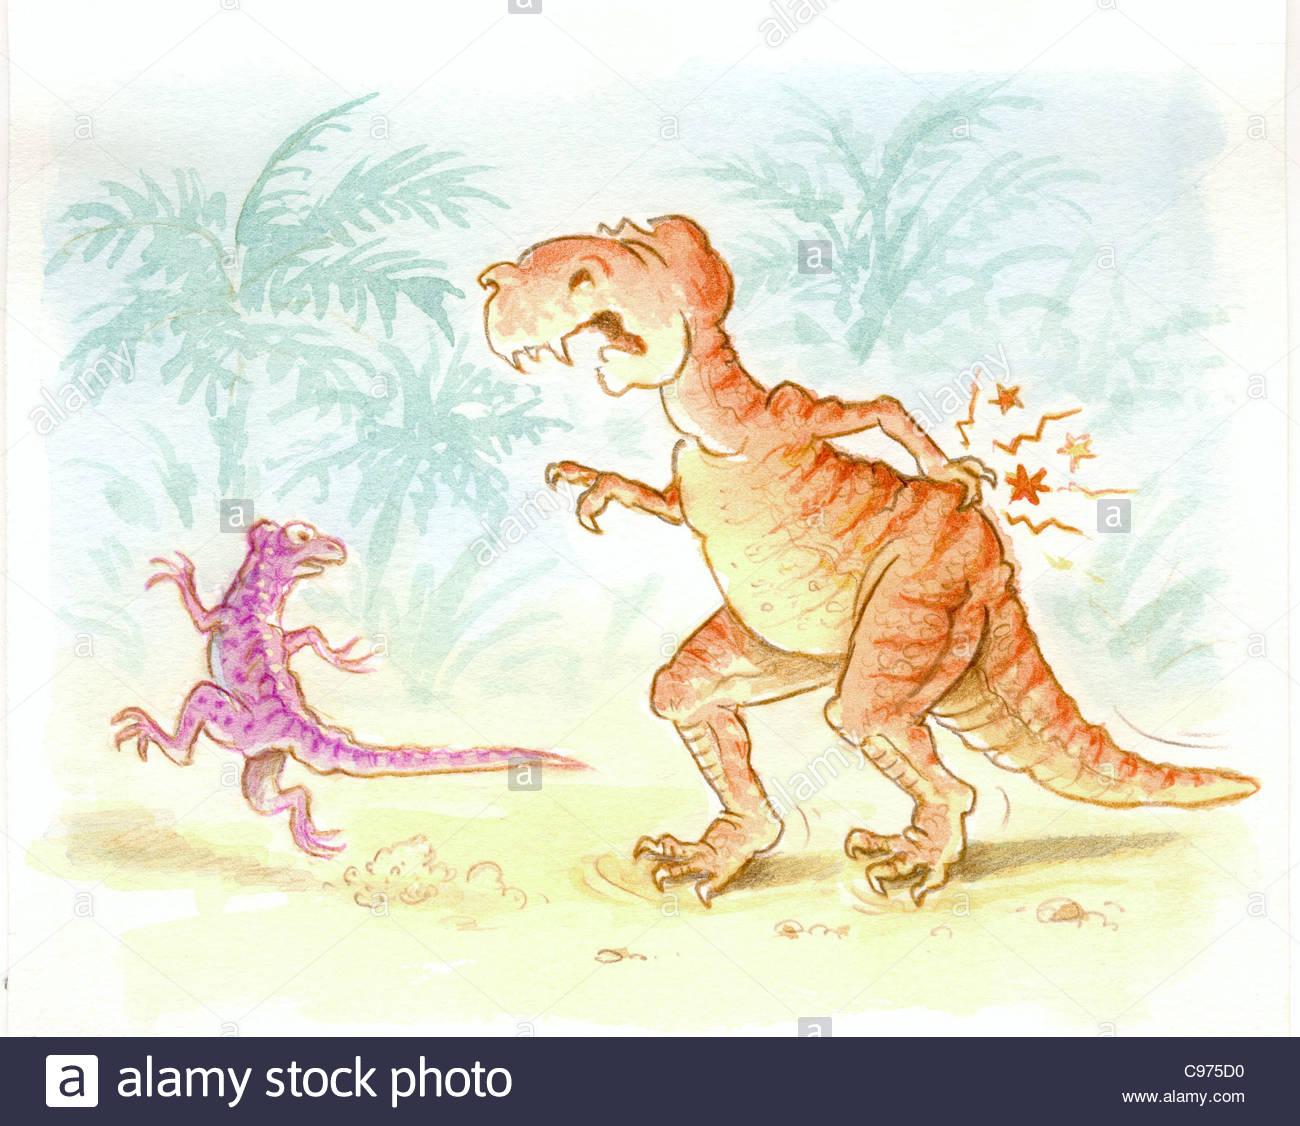 Dinosaur extinction because Herniated Disc - Stock Image